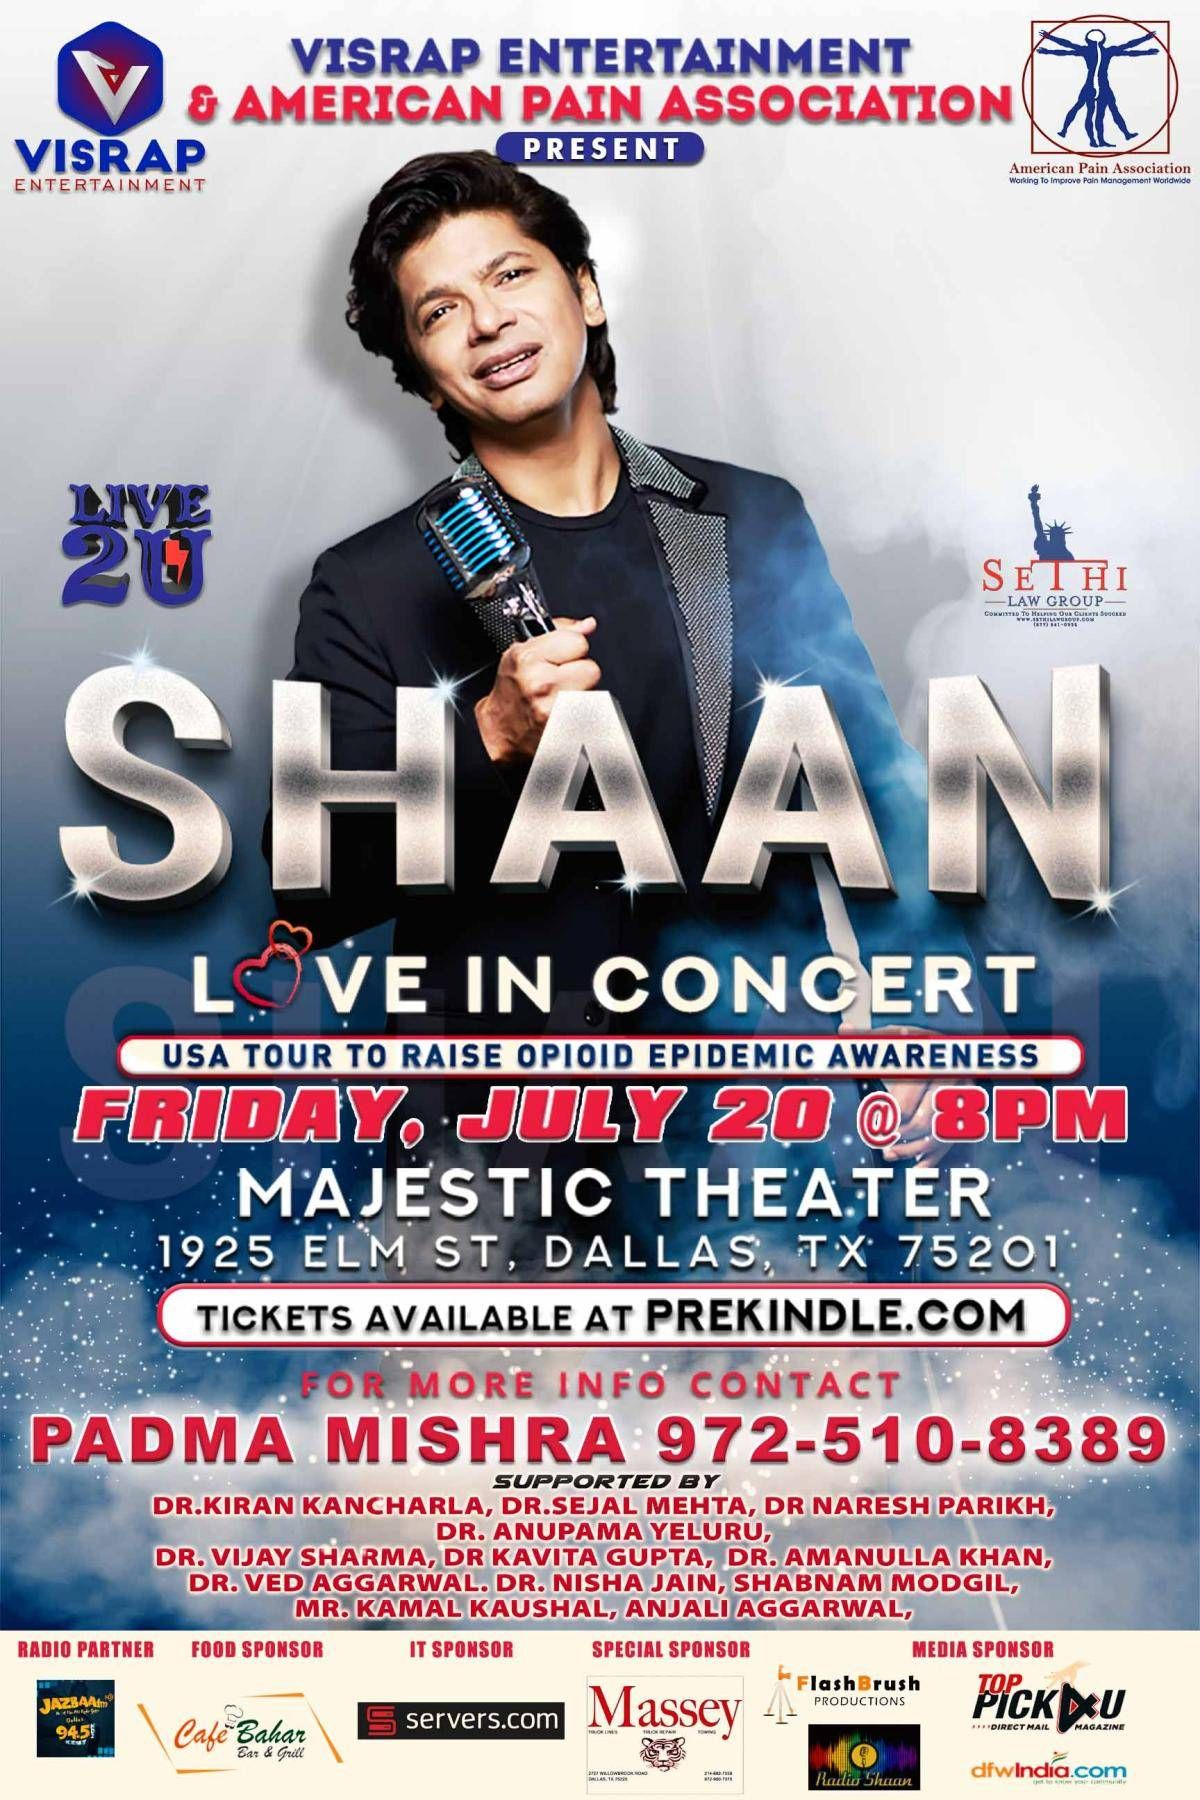 Shaan Love in Concert - Dallas